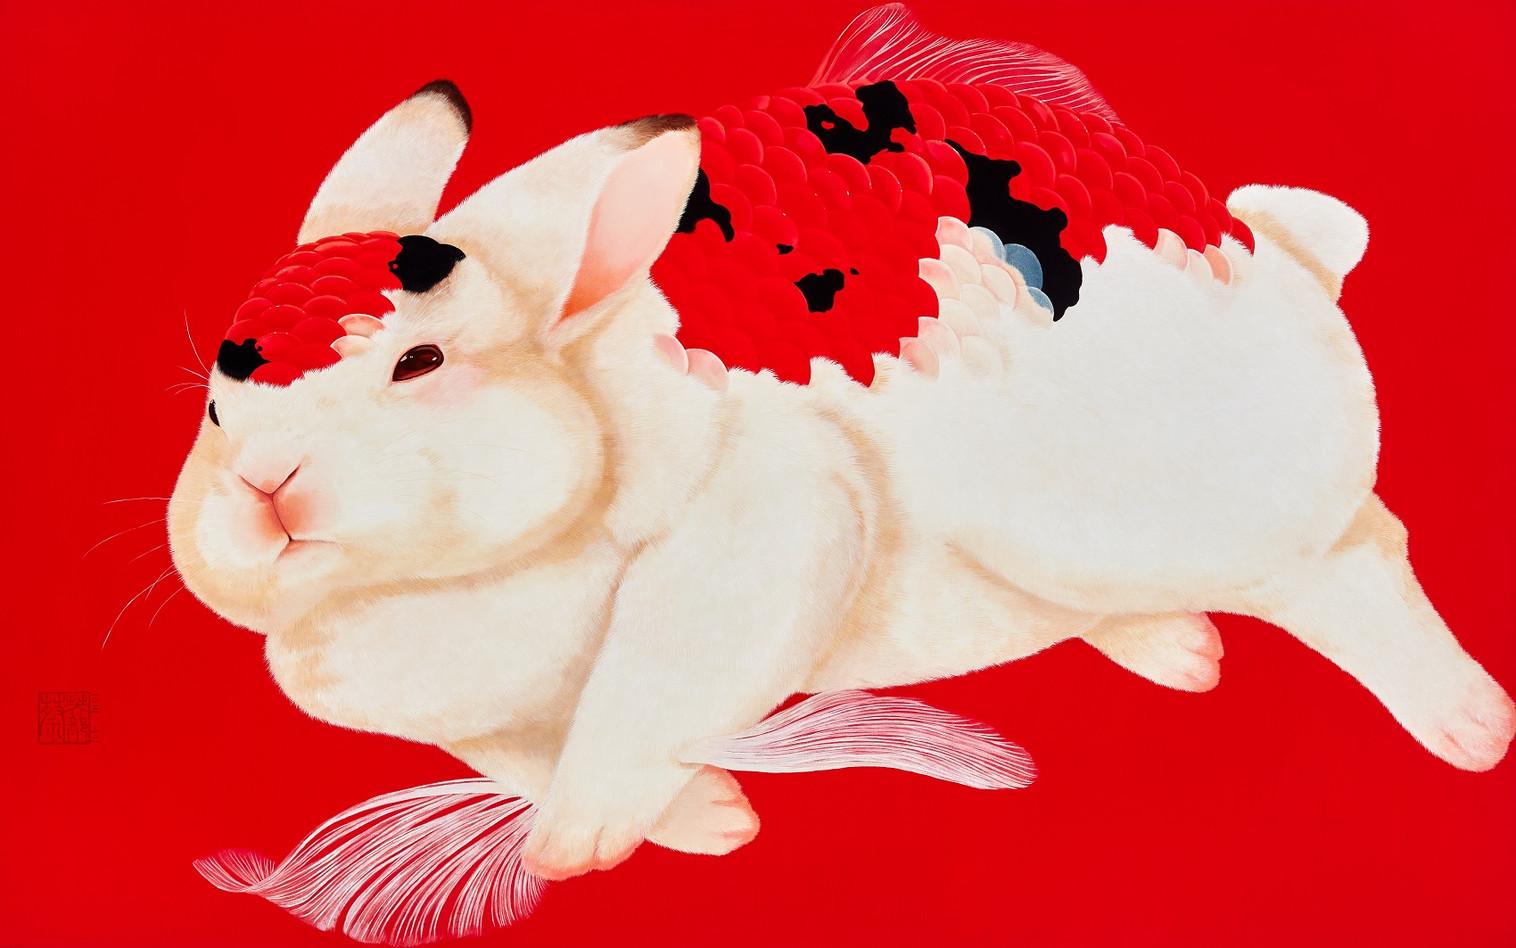 Fu Chun Tsai Spring River, 2016 Acrylic on canvas 110 x 165 cm